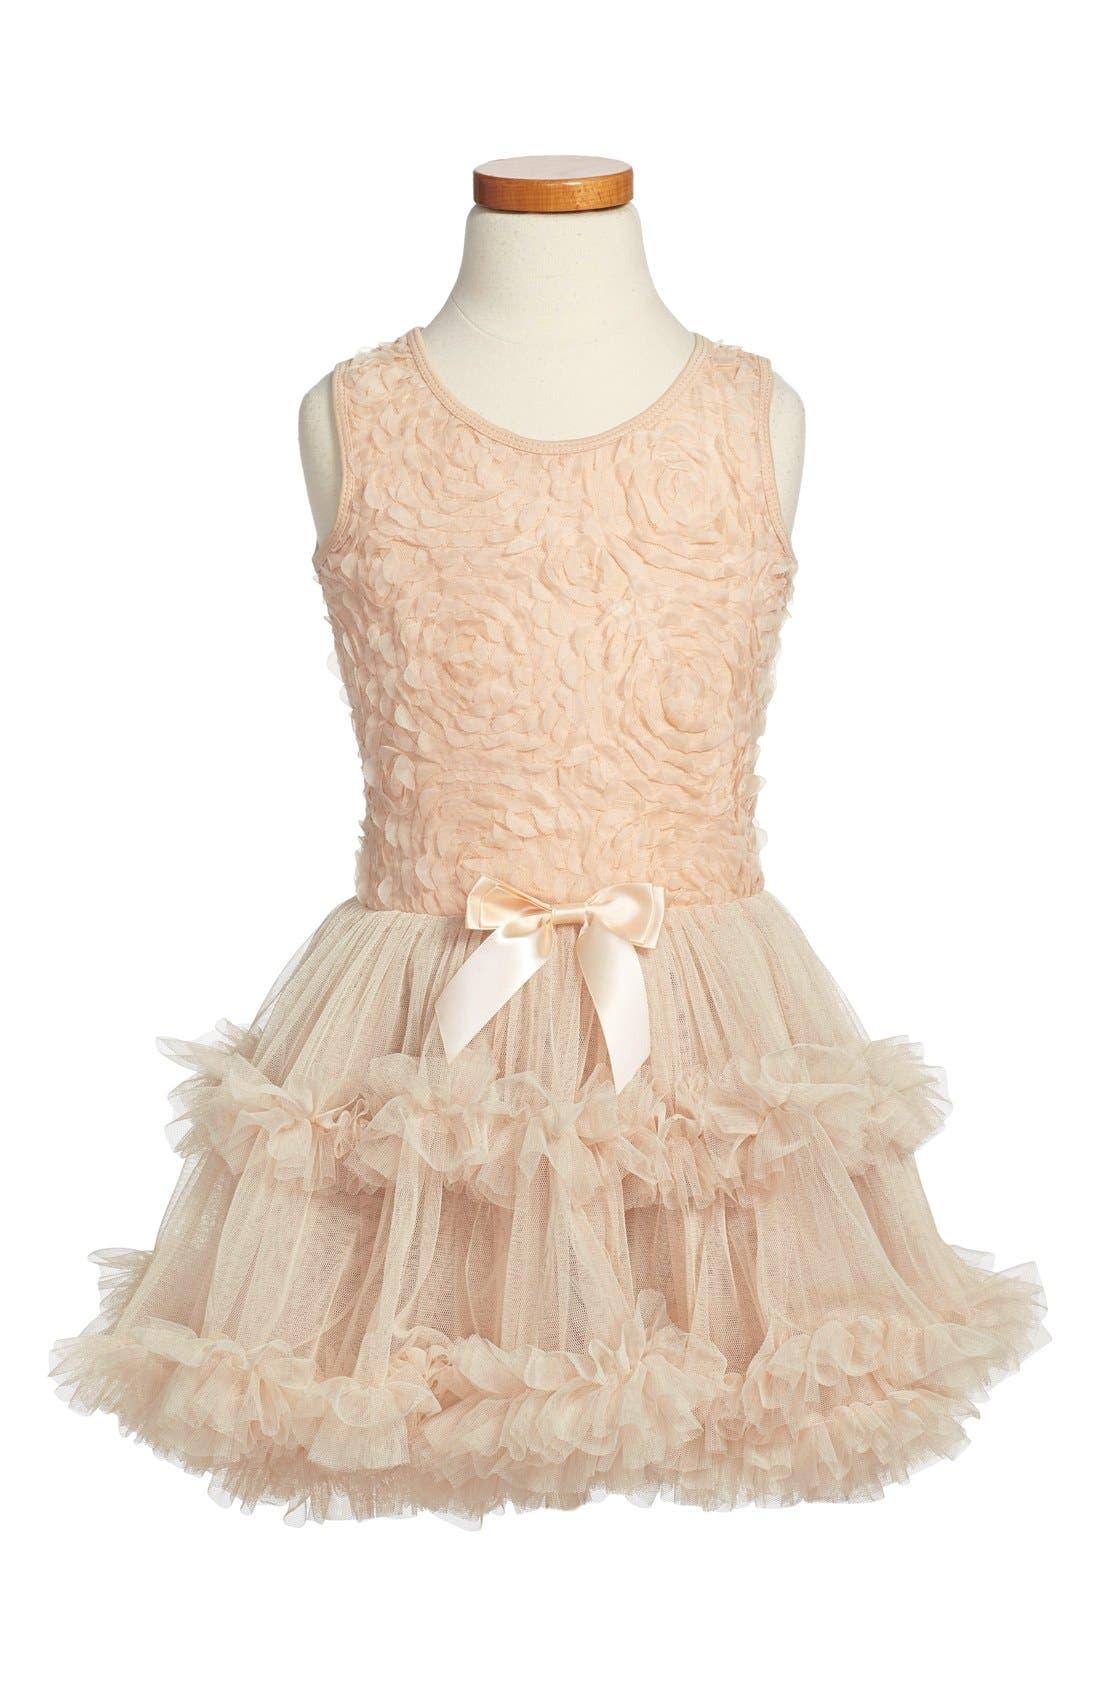 Ribbon Rosette Sleeveless Dress,                             Main thumbnail 1, color,                             Ivory